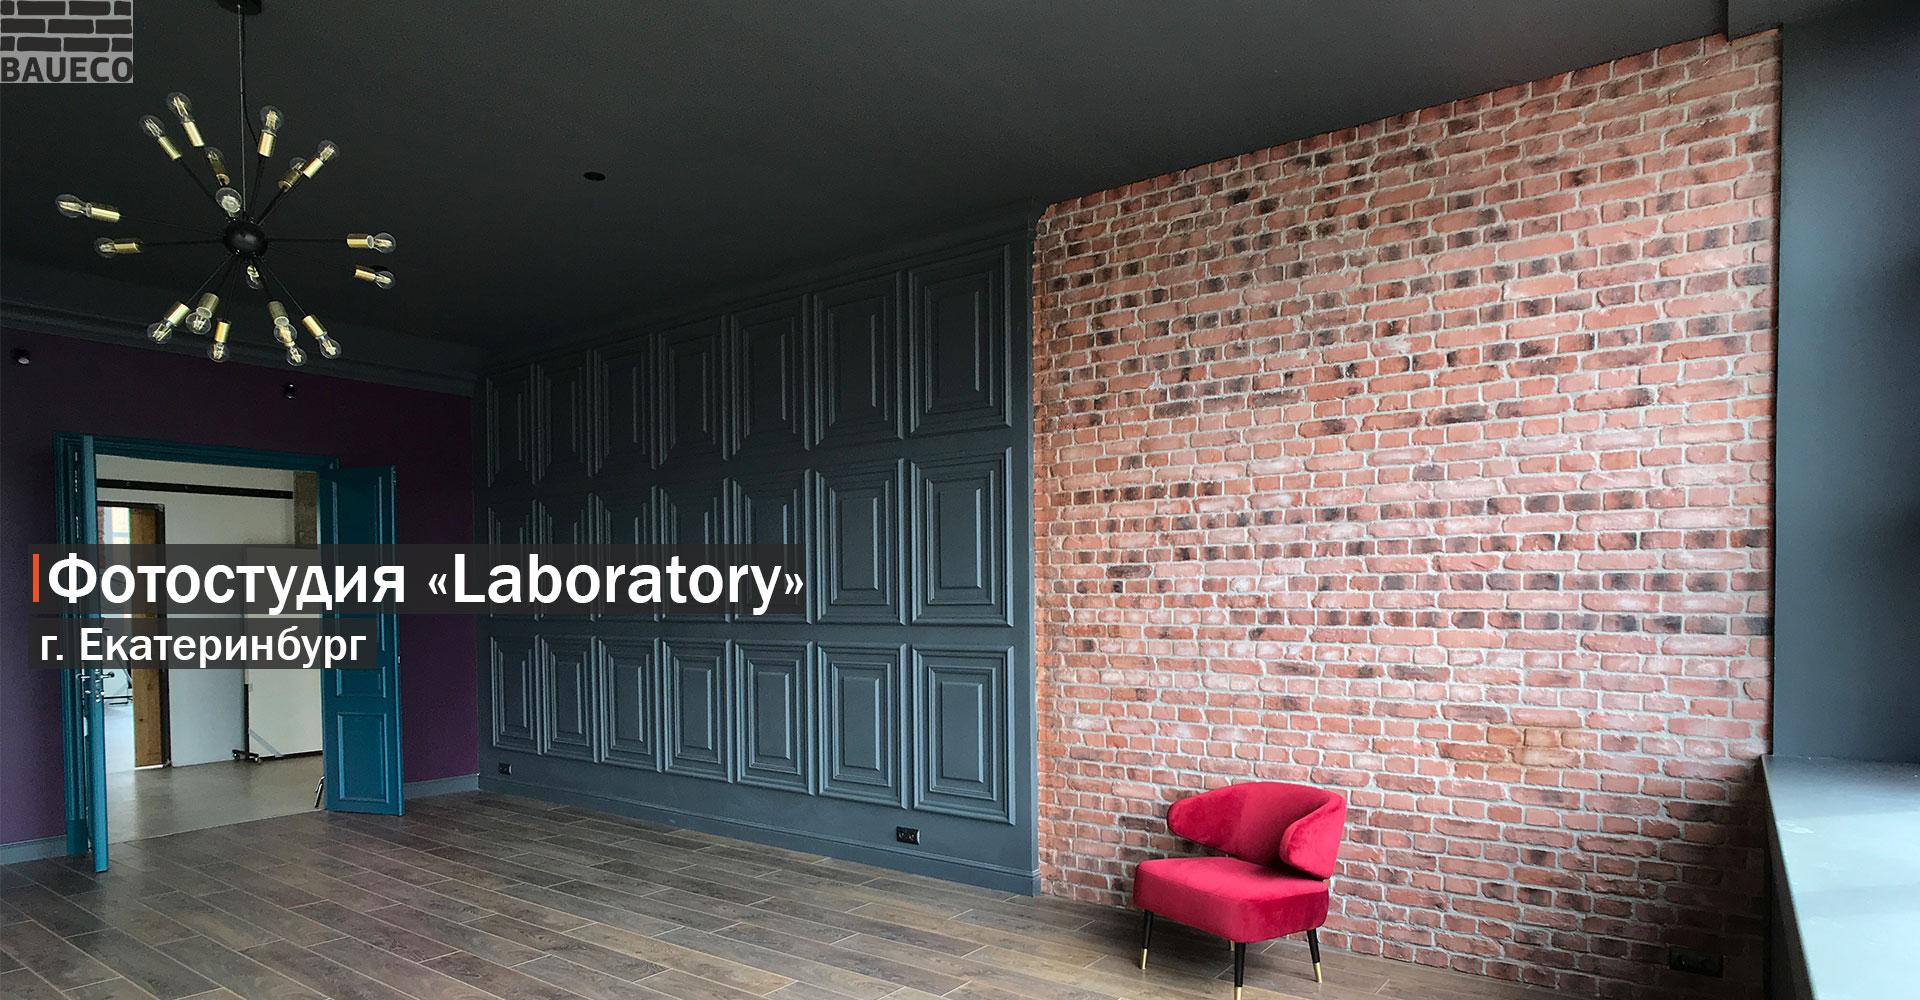 стена под кирпич БауЭко - фотостудия Laboratory